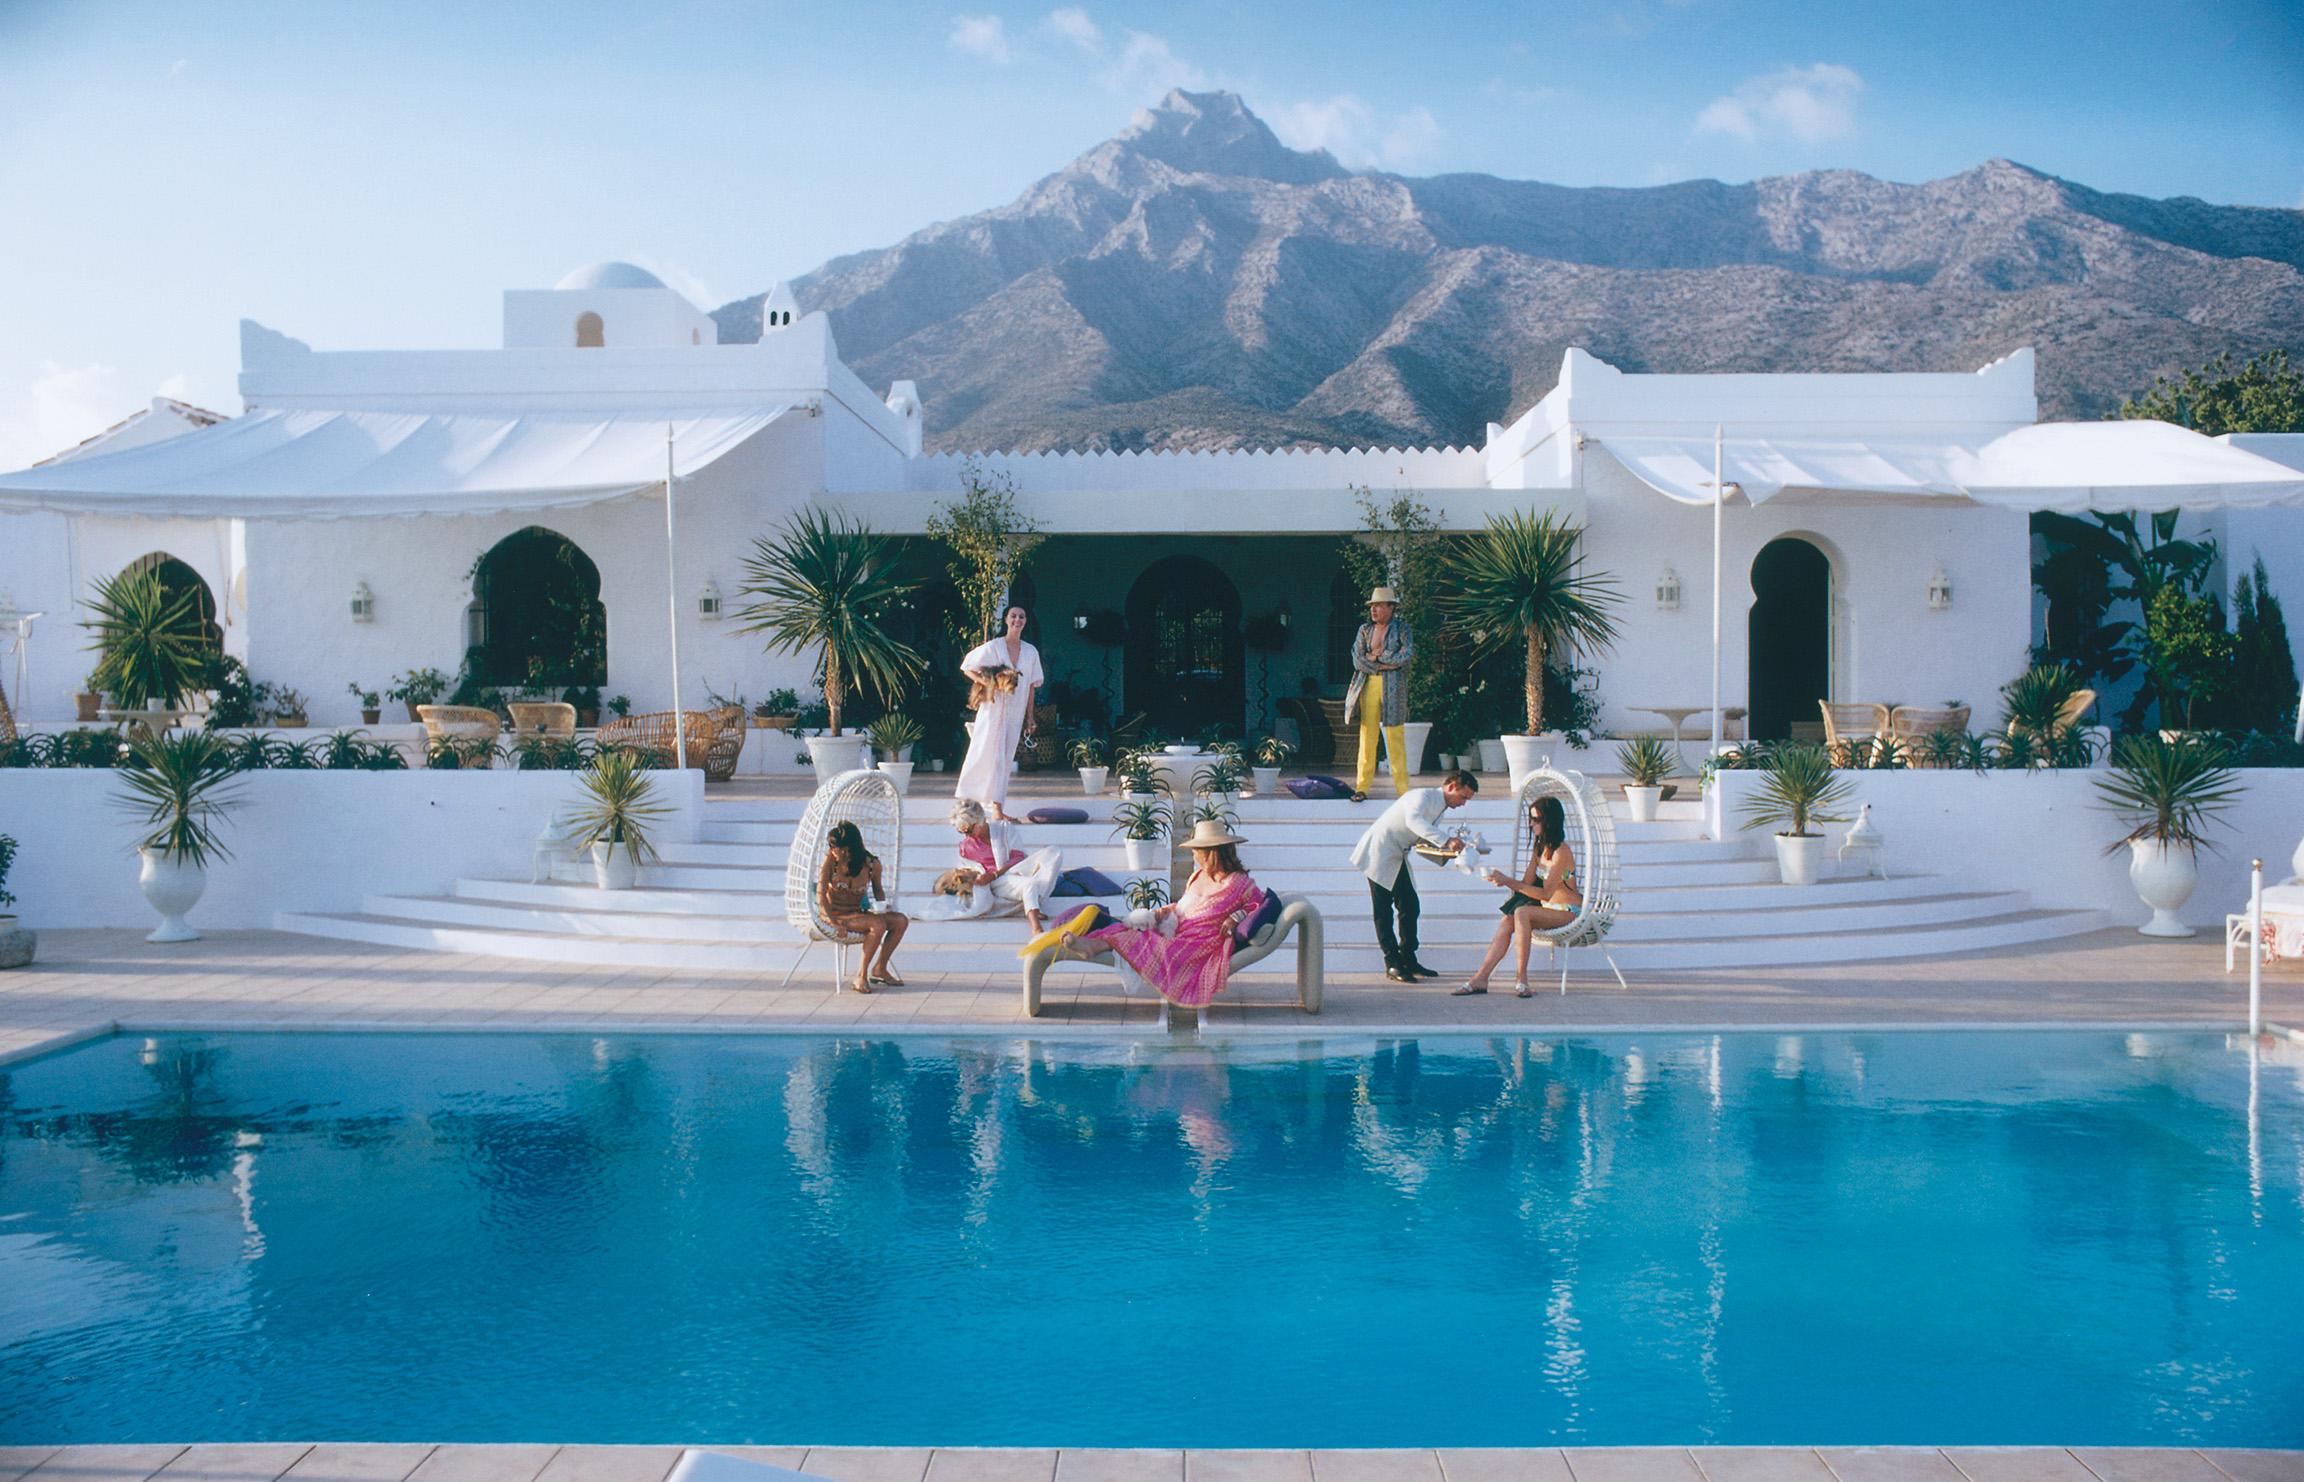 El Venero Slim Aarons Reproduction Photograph - Mecox Gardens